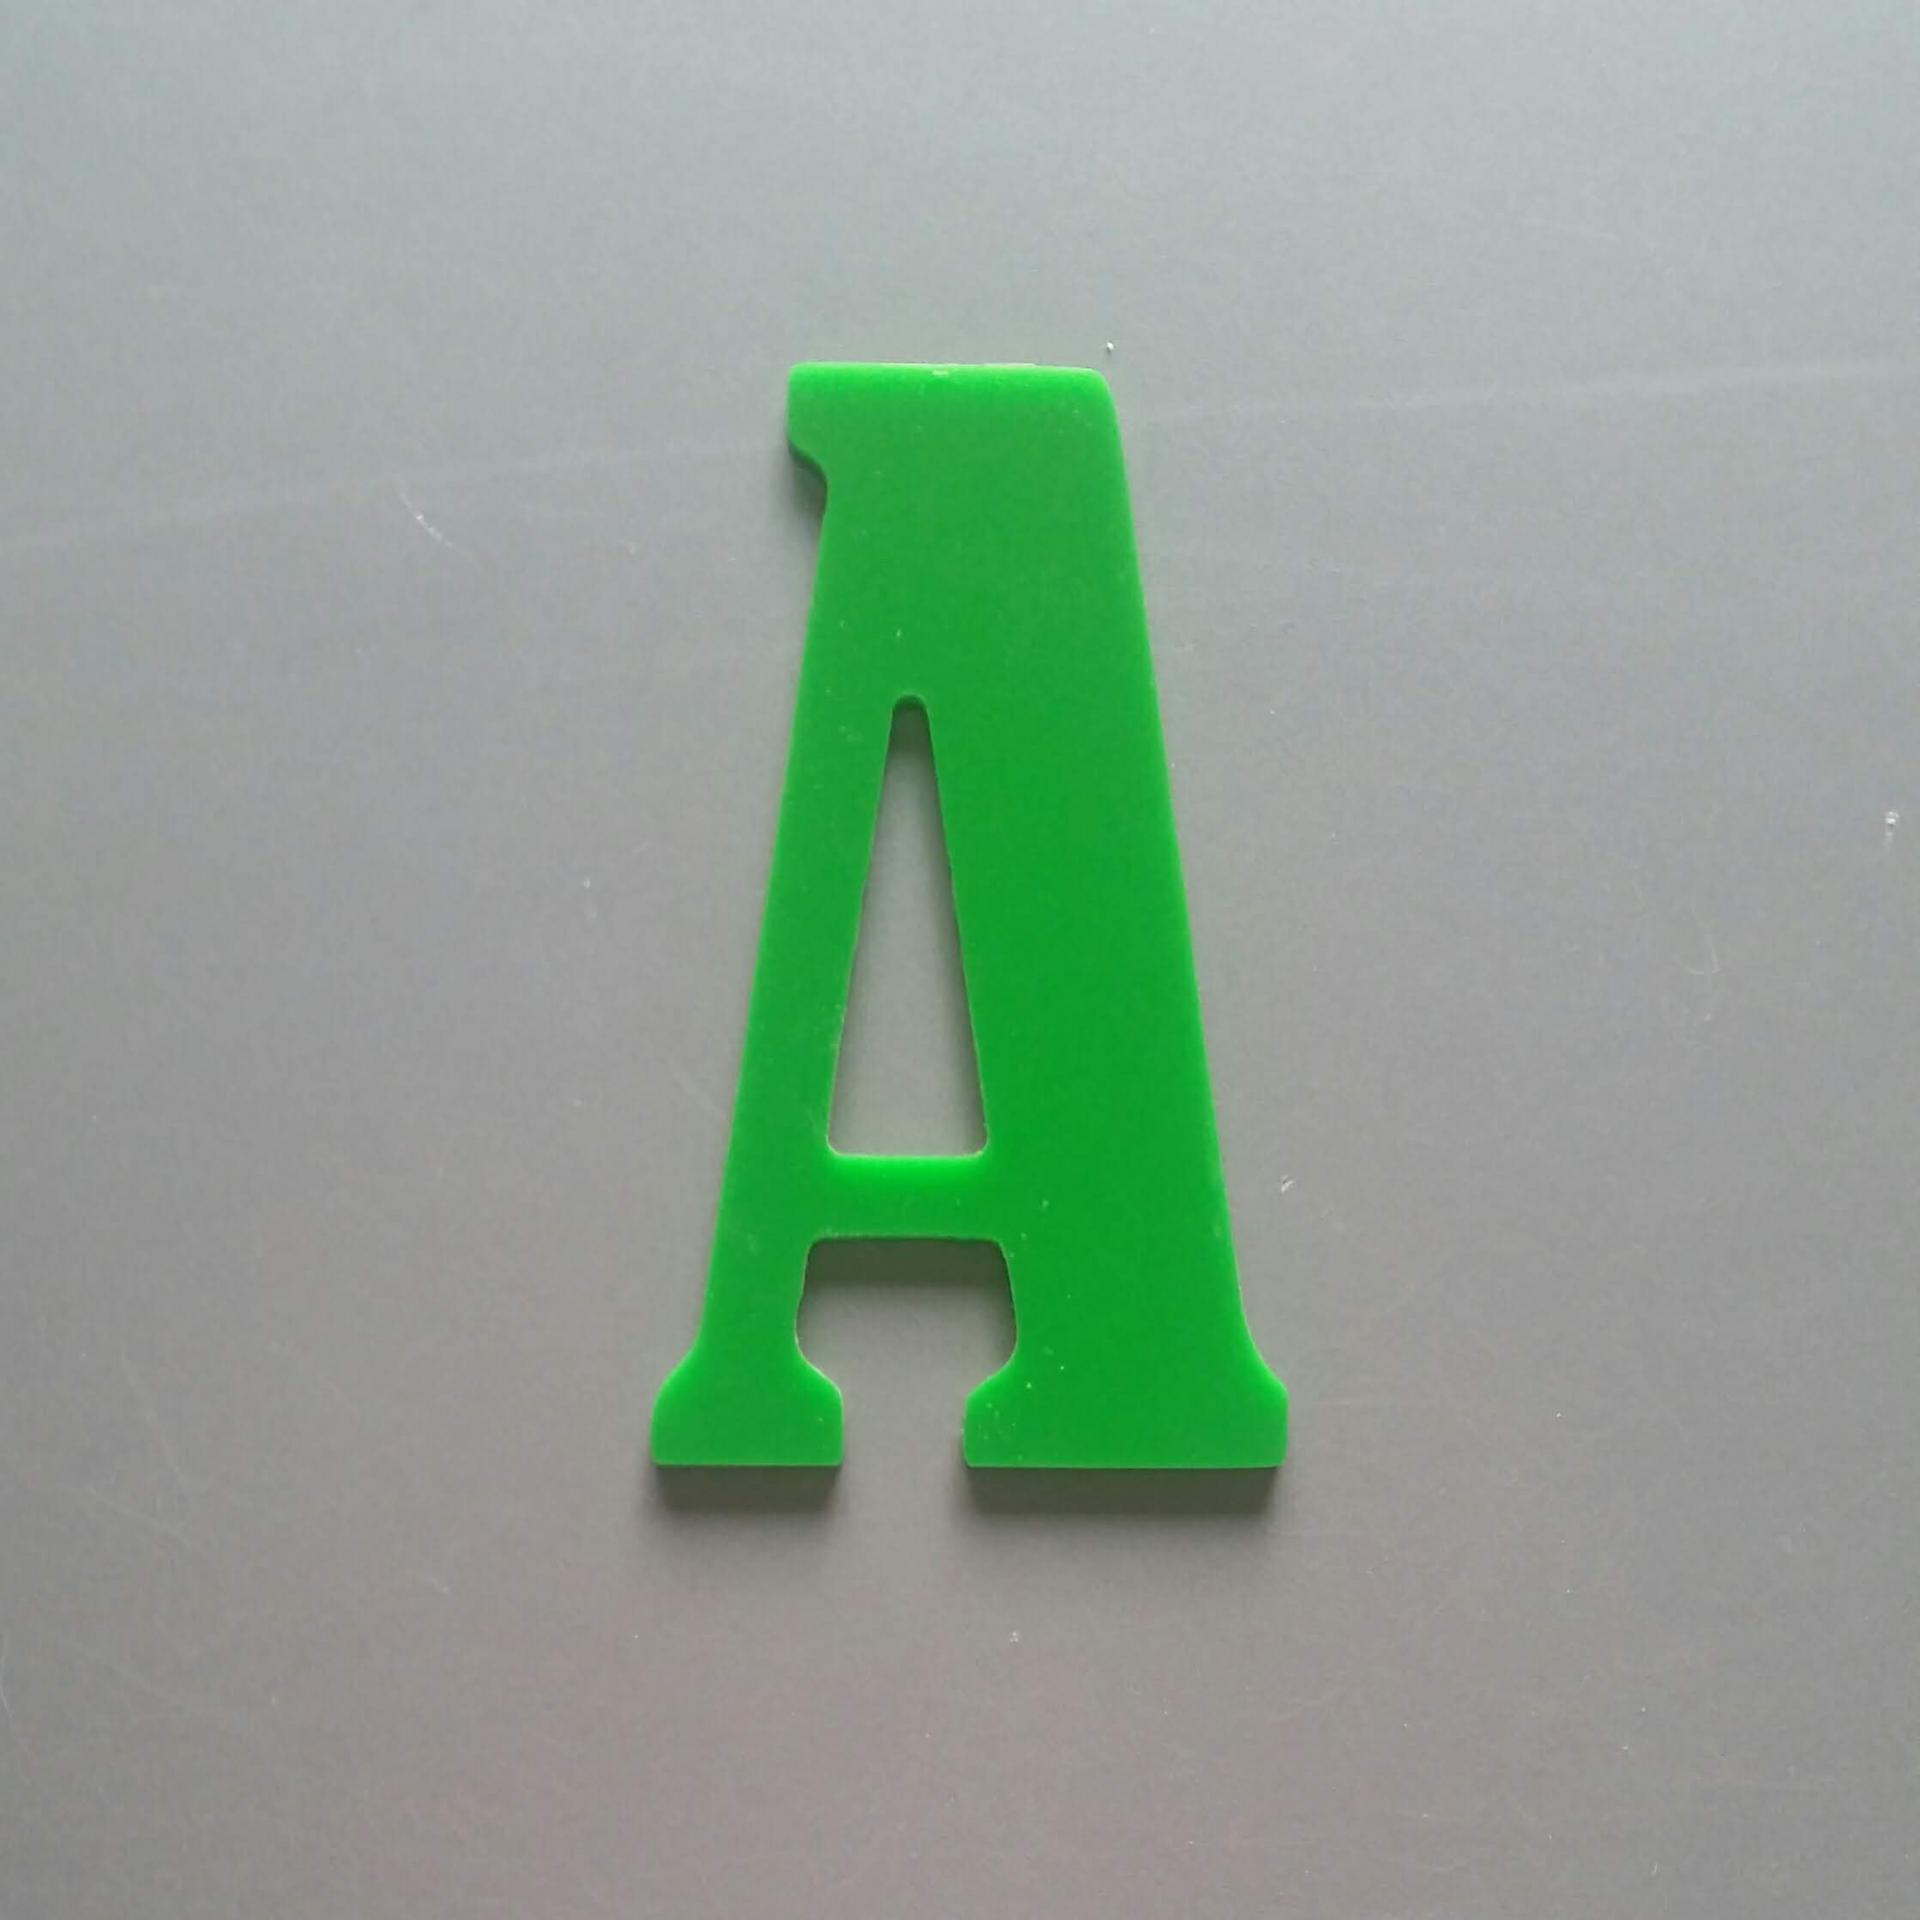 Lettre plexi bernard condensed